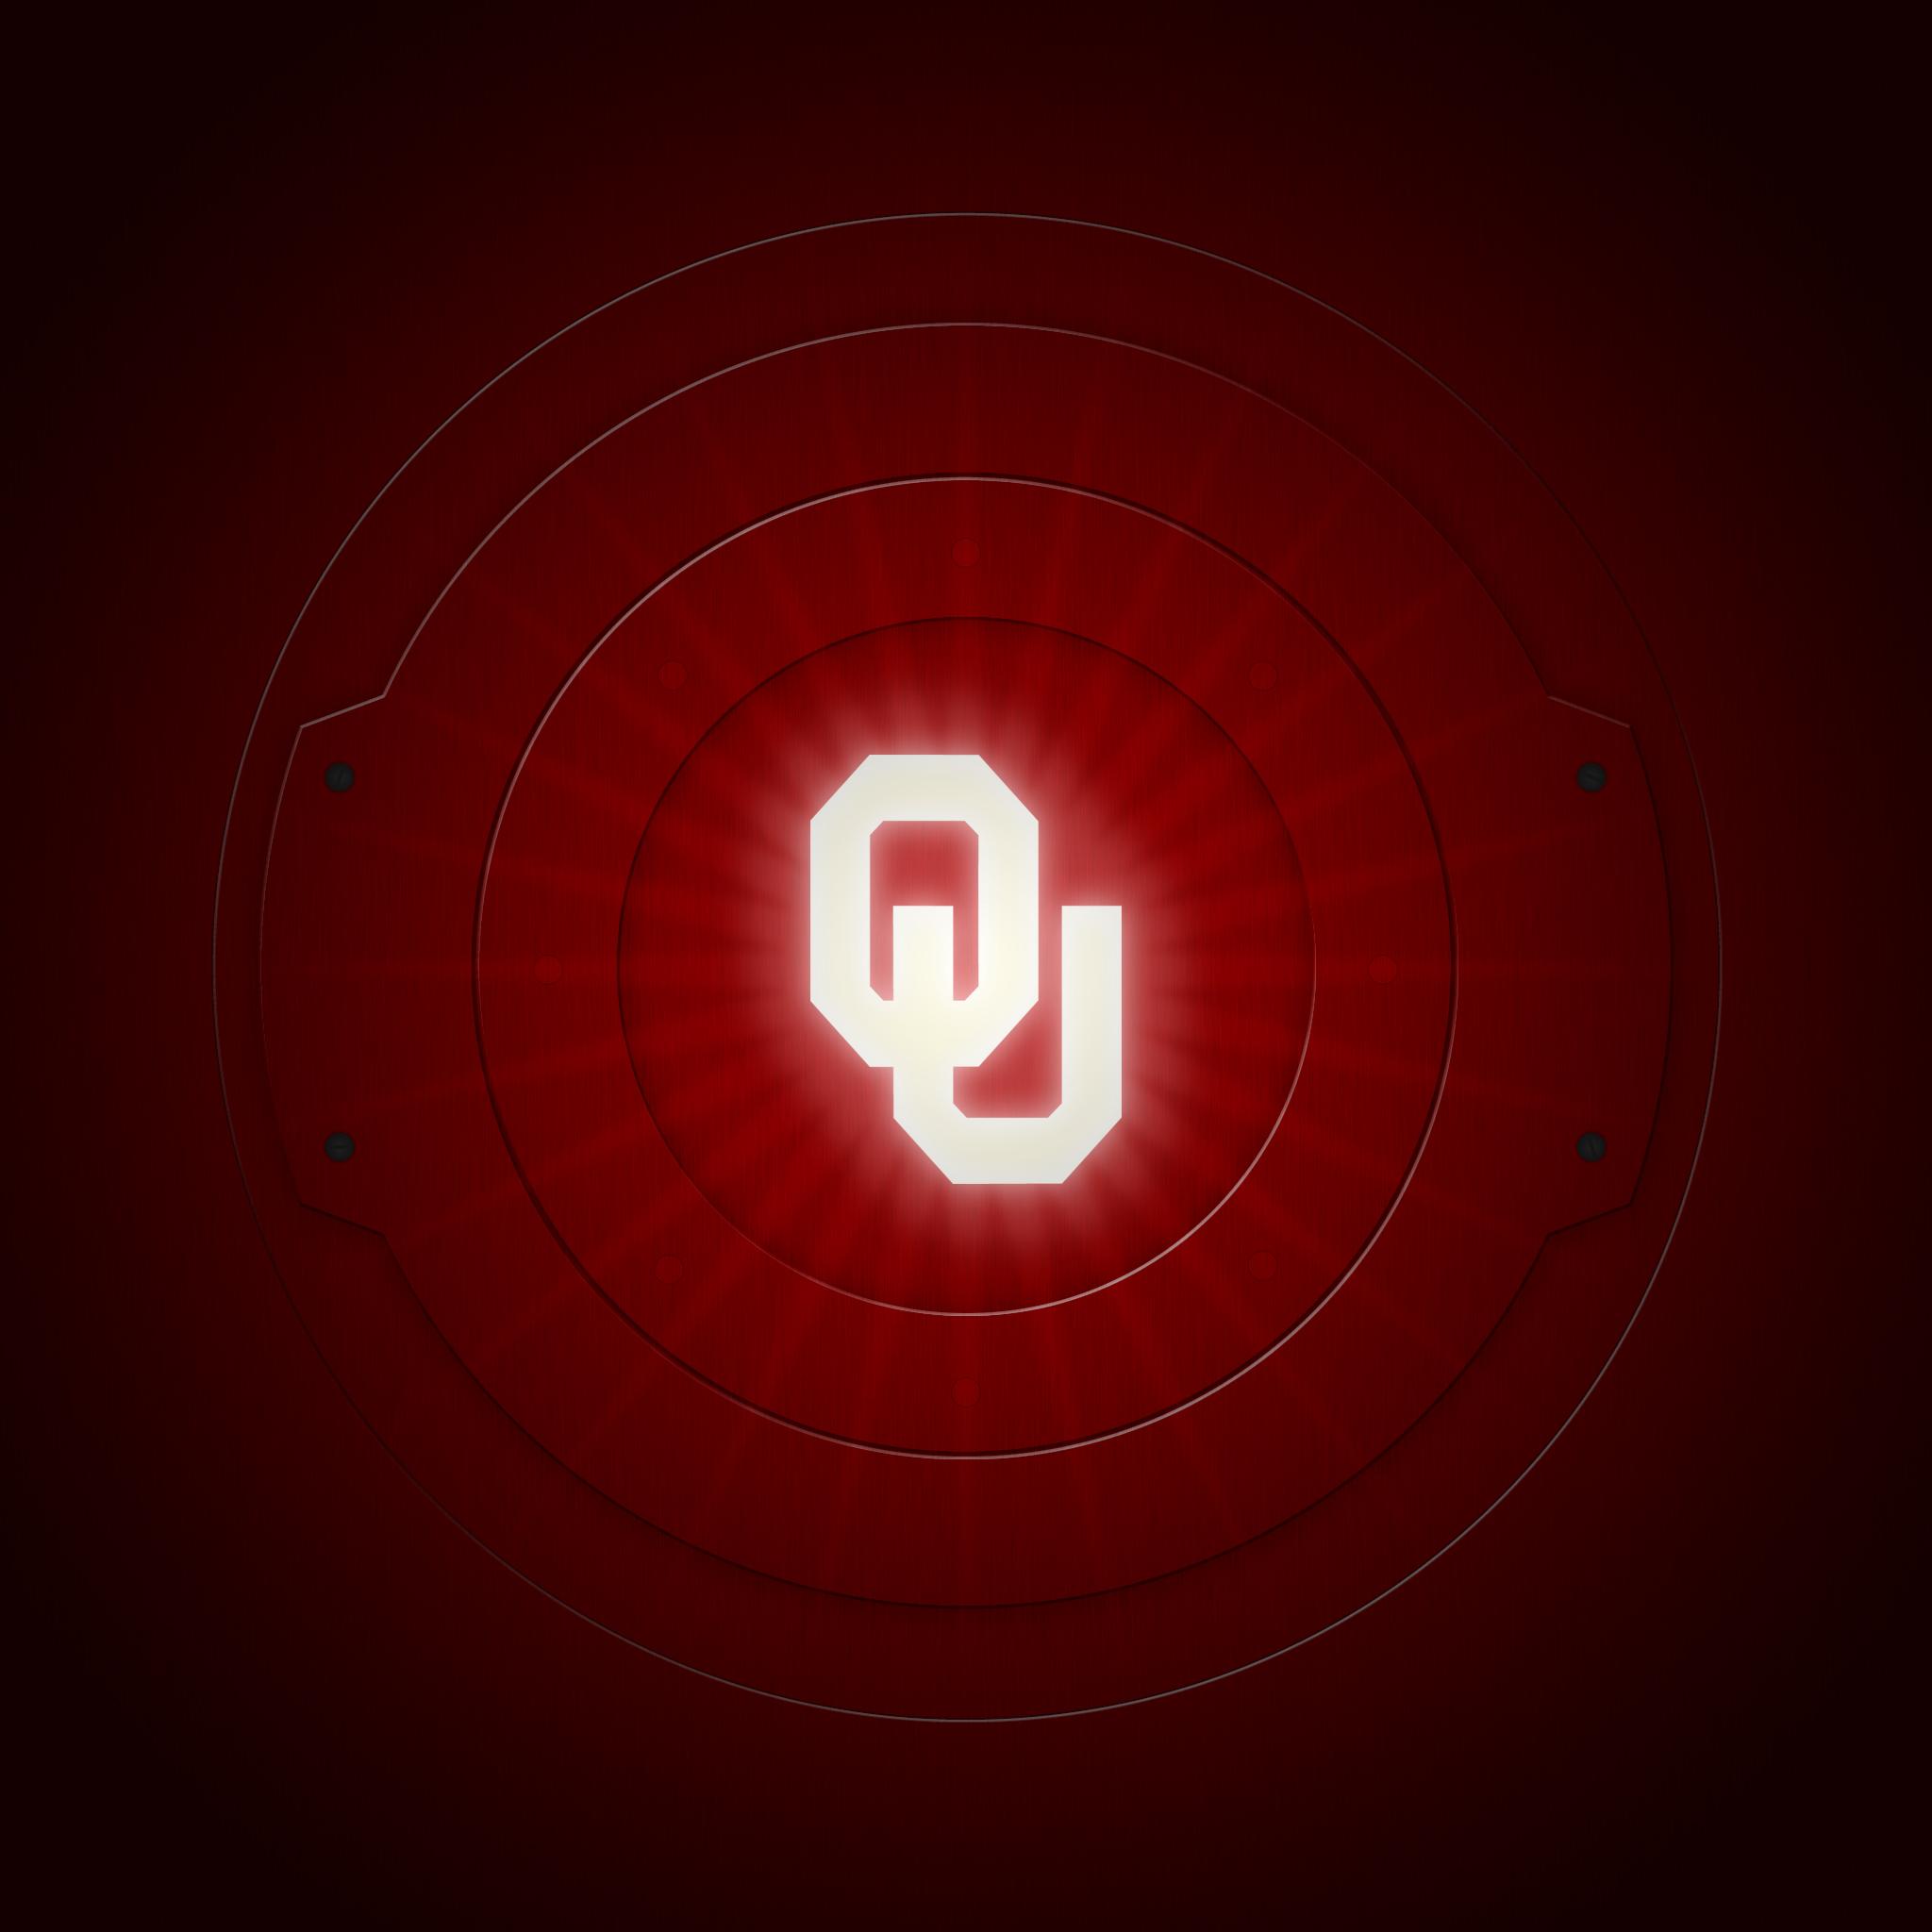 Oklahoma Sooners Wallpaper For Iphone Ipad Ou Powerup